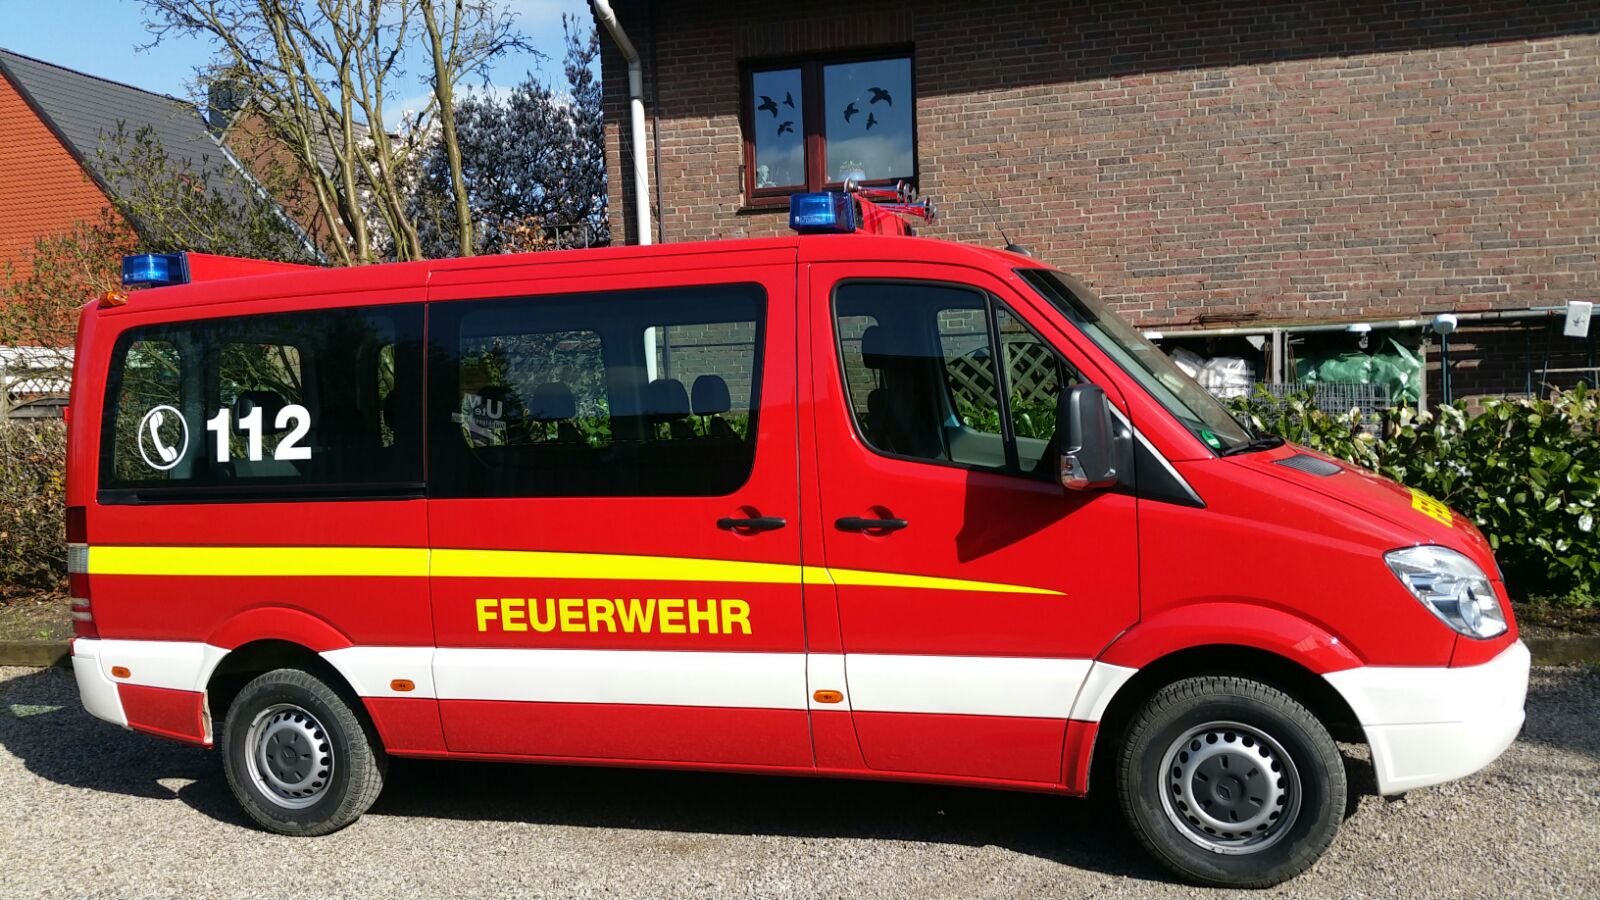 http://feuerwehr-buxtehude.de/media/img/bilder_ow_im/bilder_im_fa/mtf/4176b.jpg